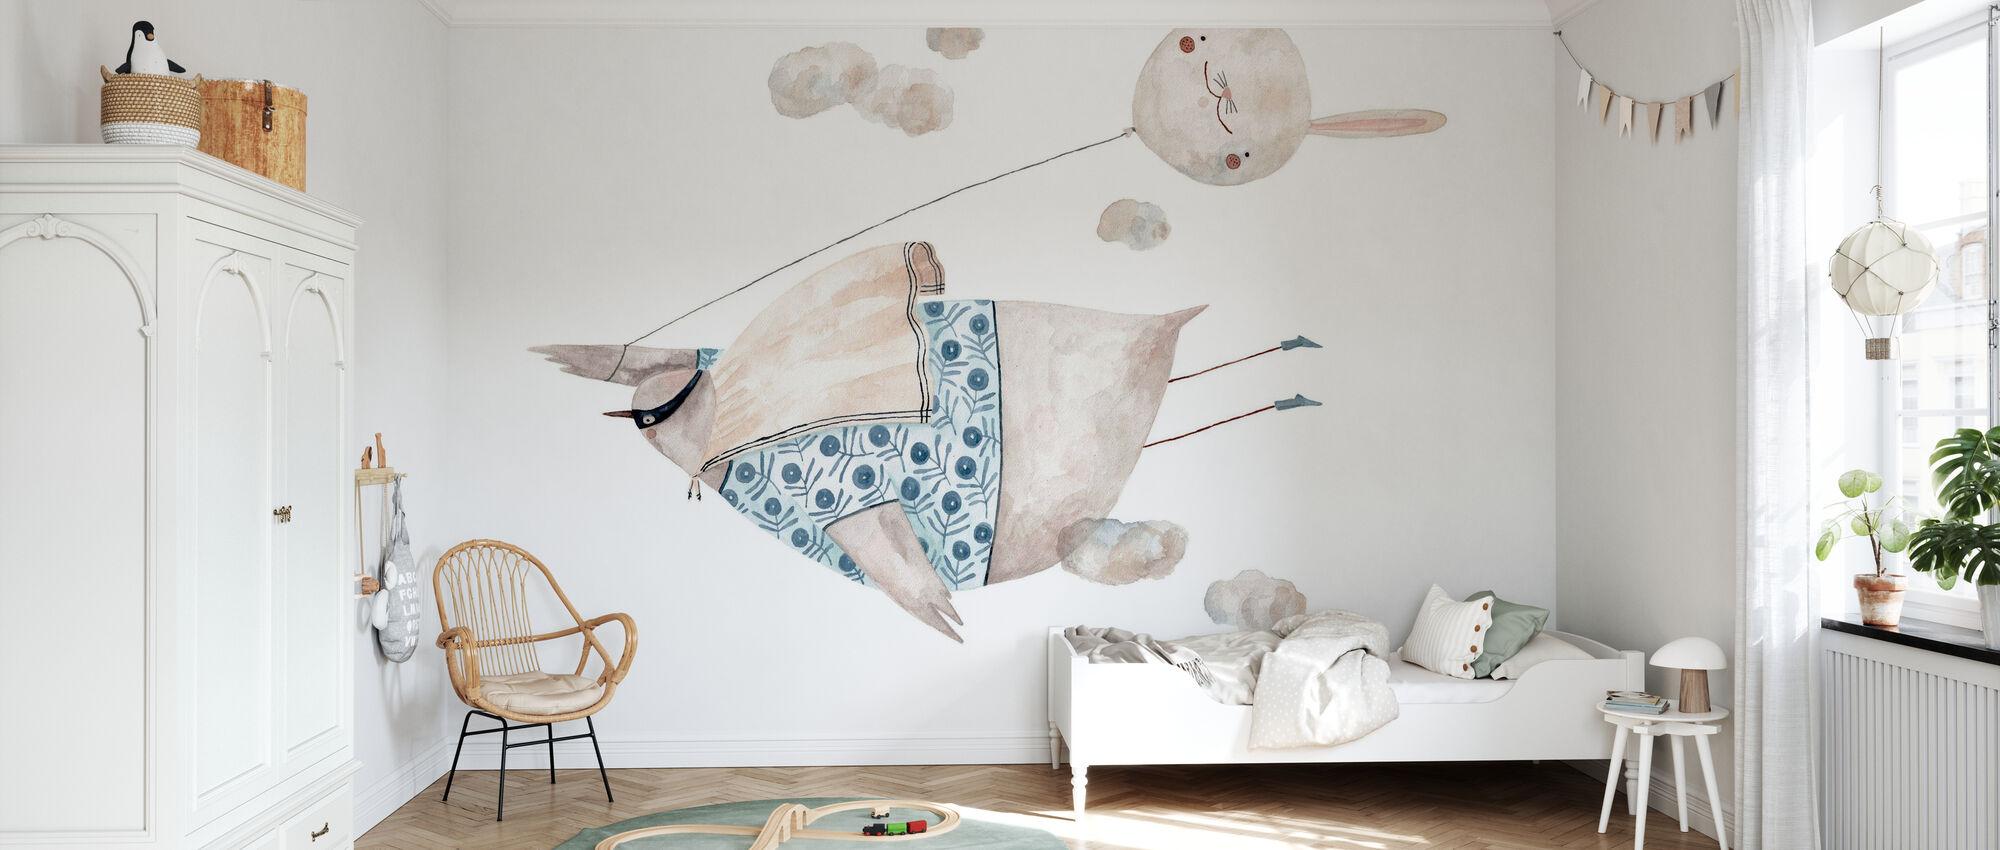 superpower - Wallpaper - Kids Room